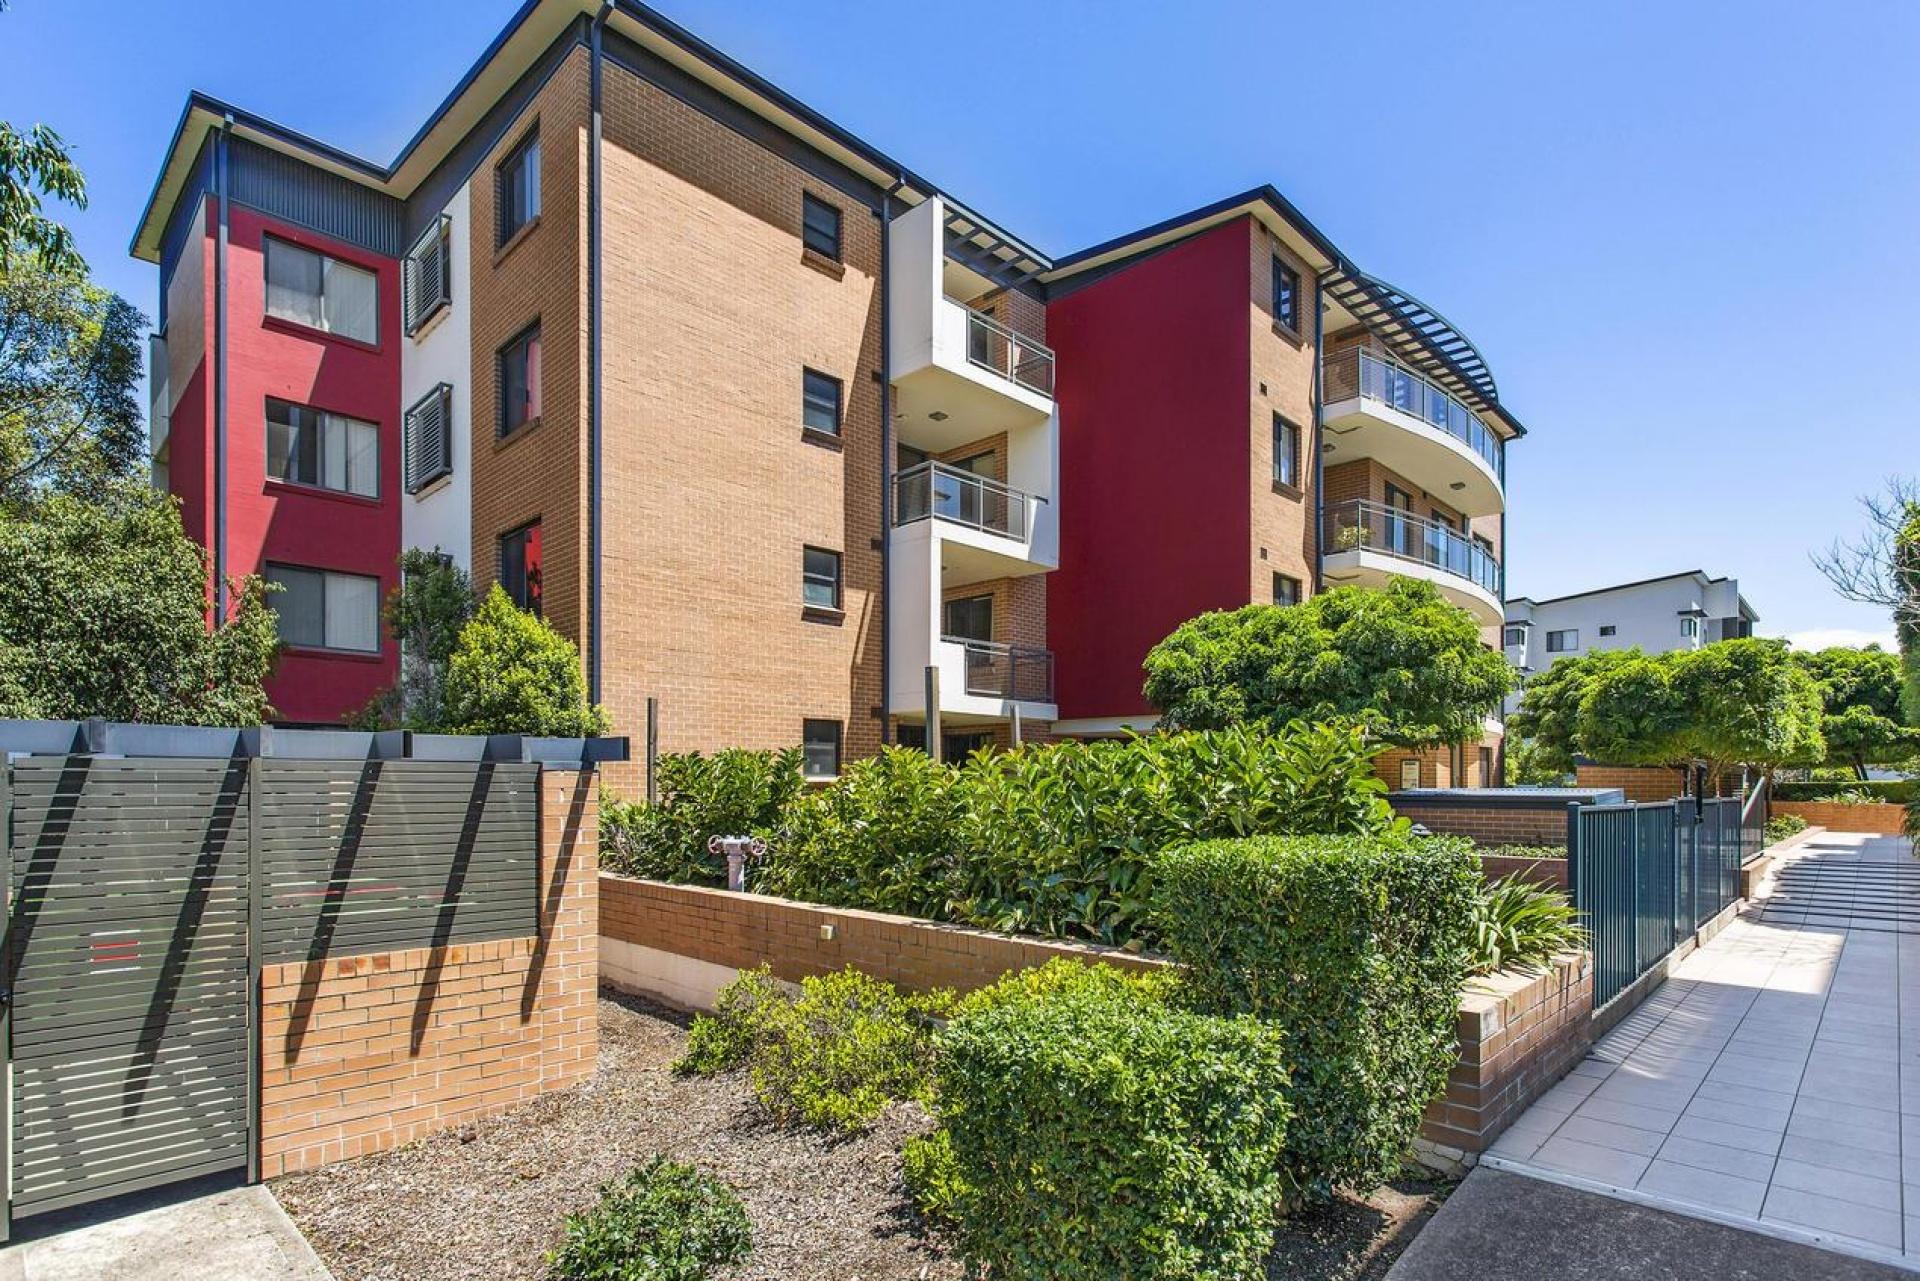 3 Bedrooms, Apartment, Sold , Kilbenny Street, 2 Bathrooms, Listing ID 1122, KELLYVILLE RIDGE, NSW, Australia,